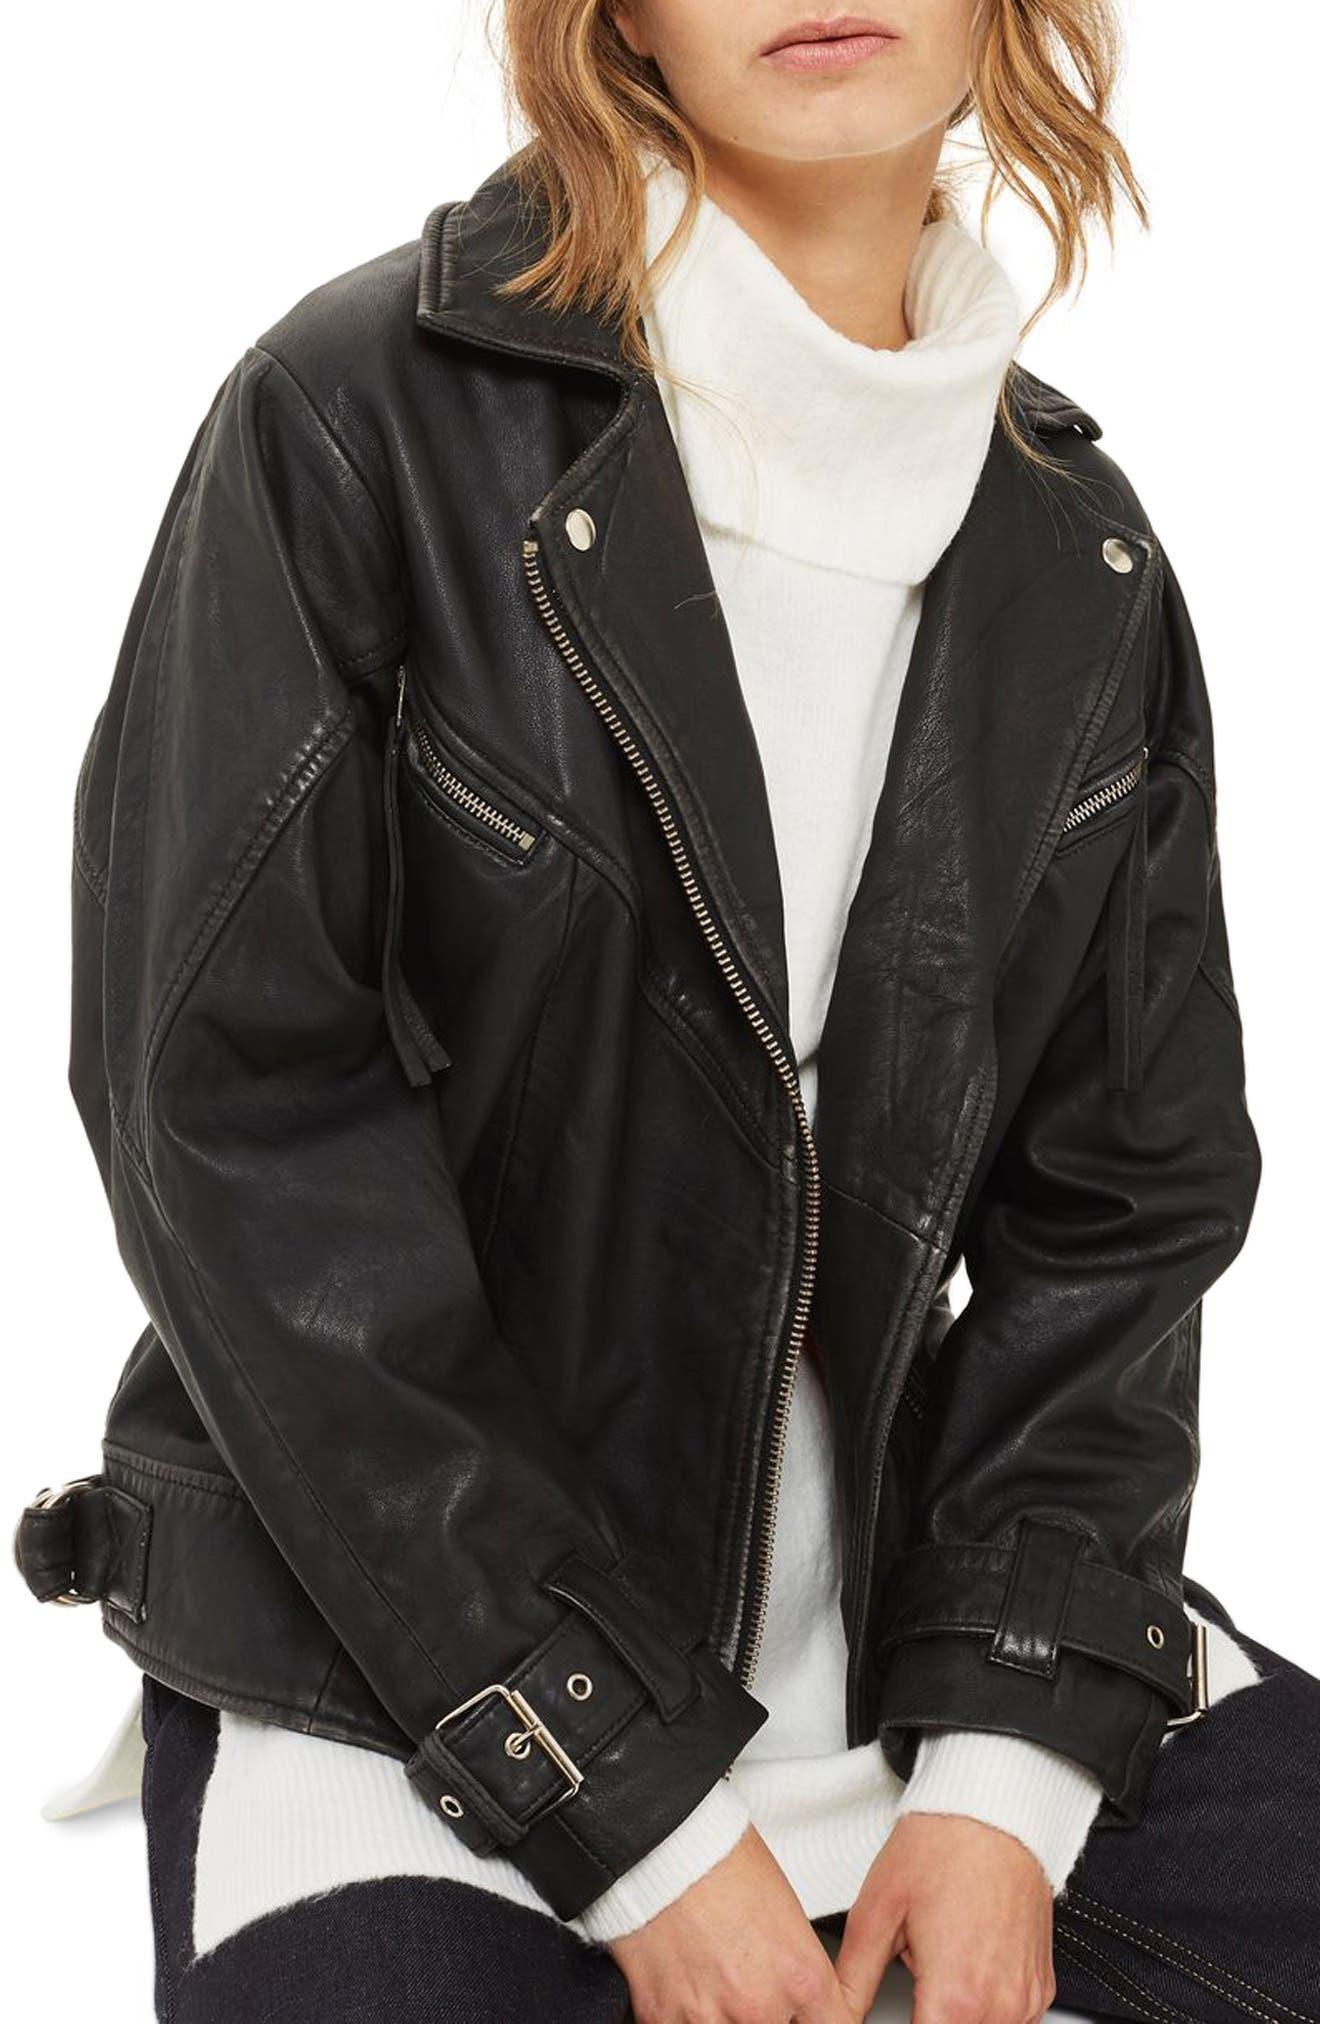 Topshop Teddy Oversize Leather Biker Jacket